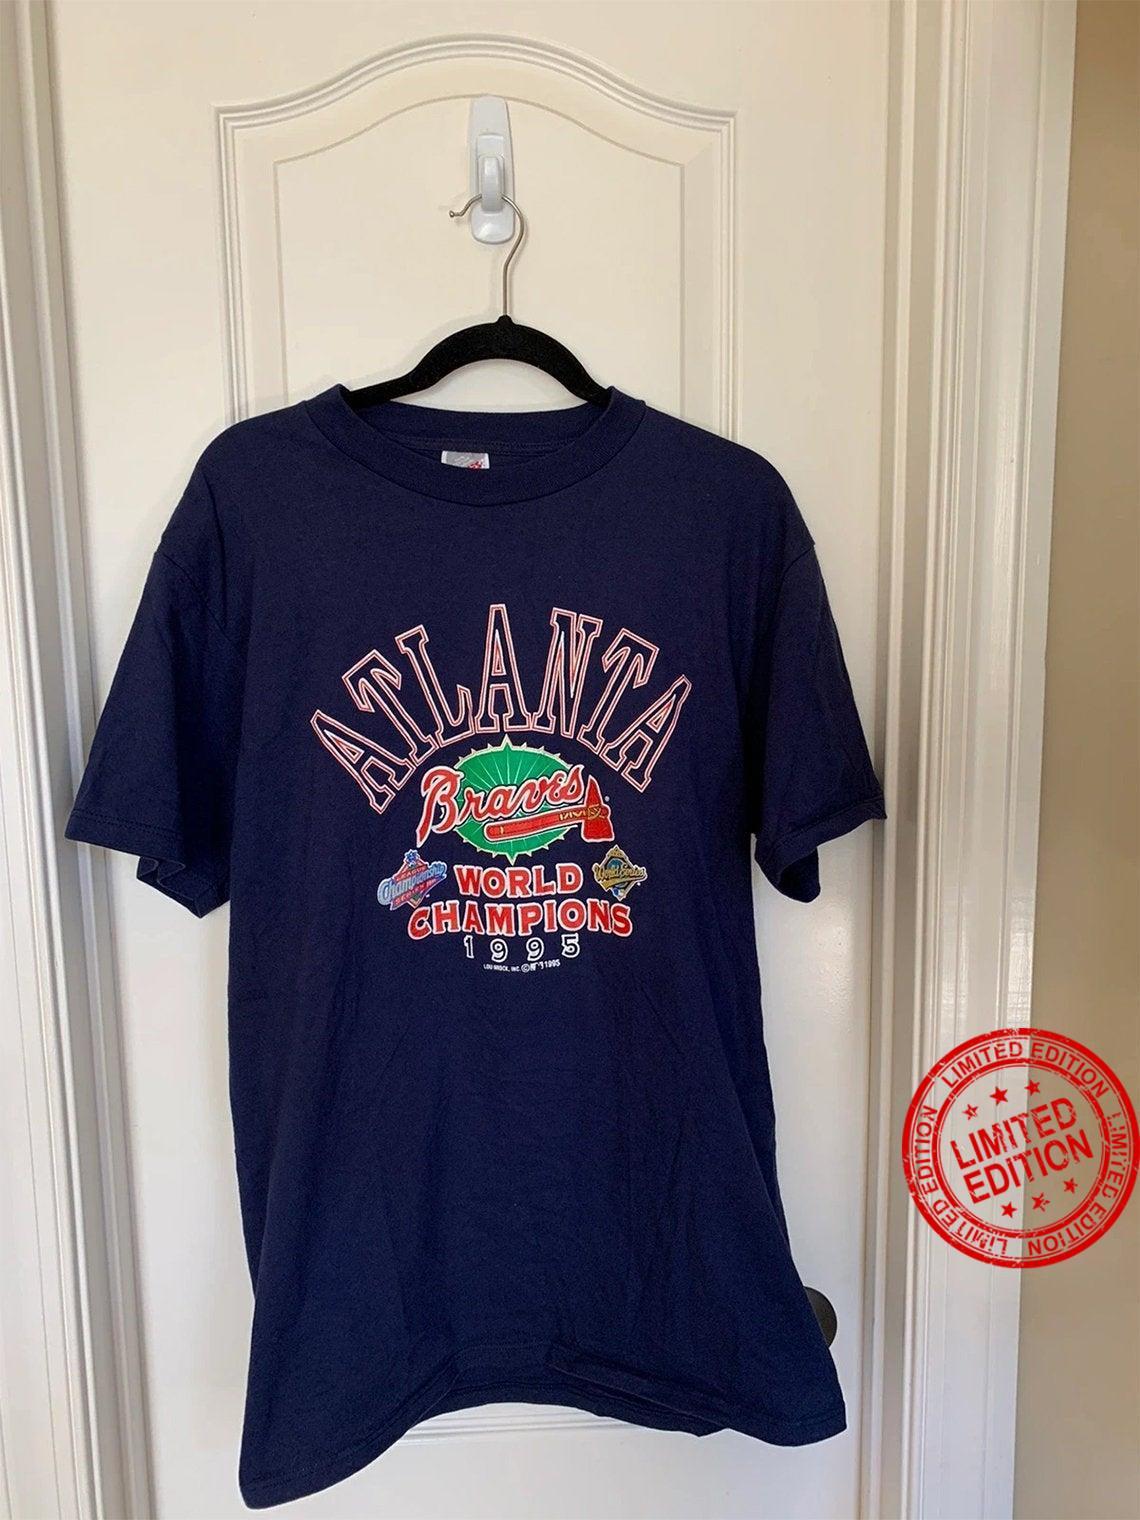 Vintage 1995 atlanta braves world champions shirt